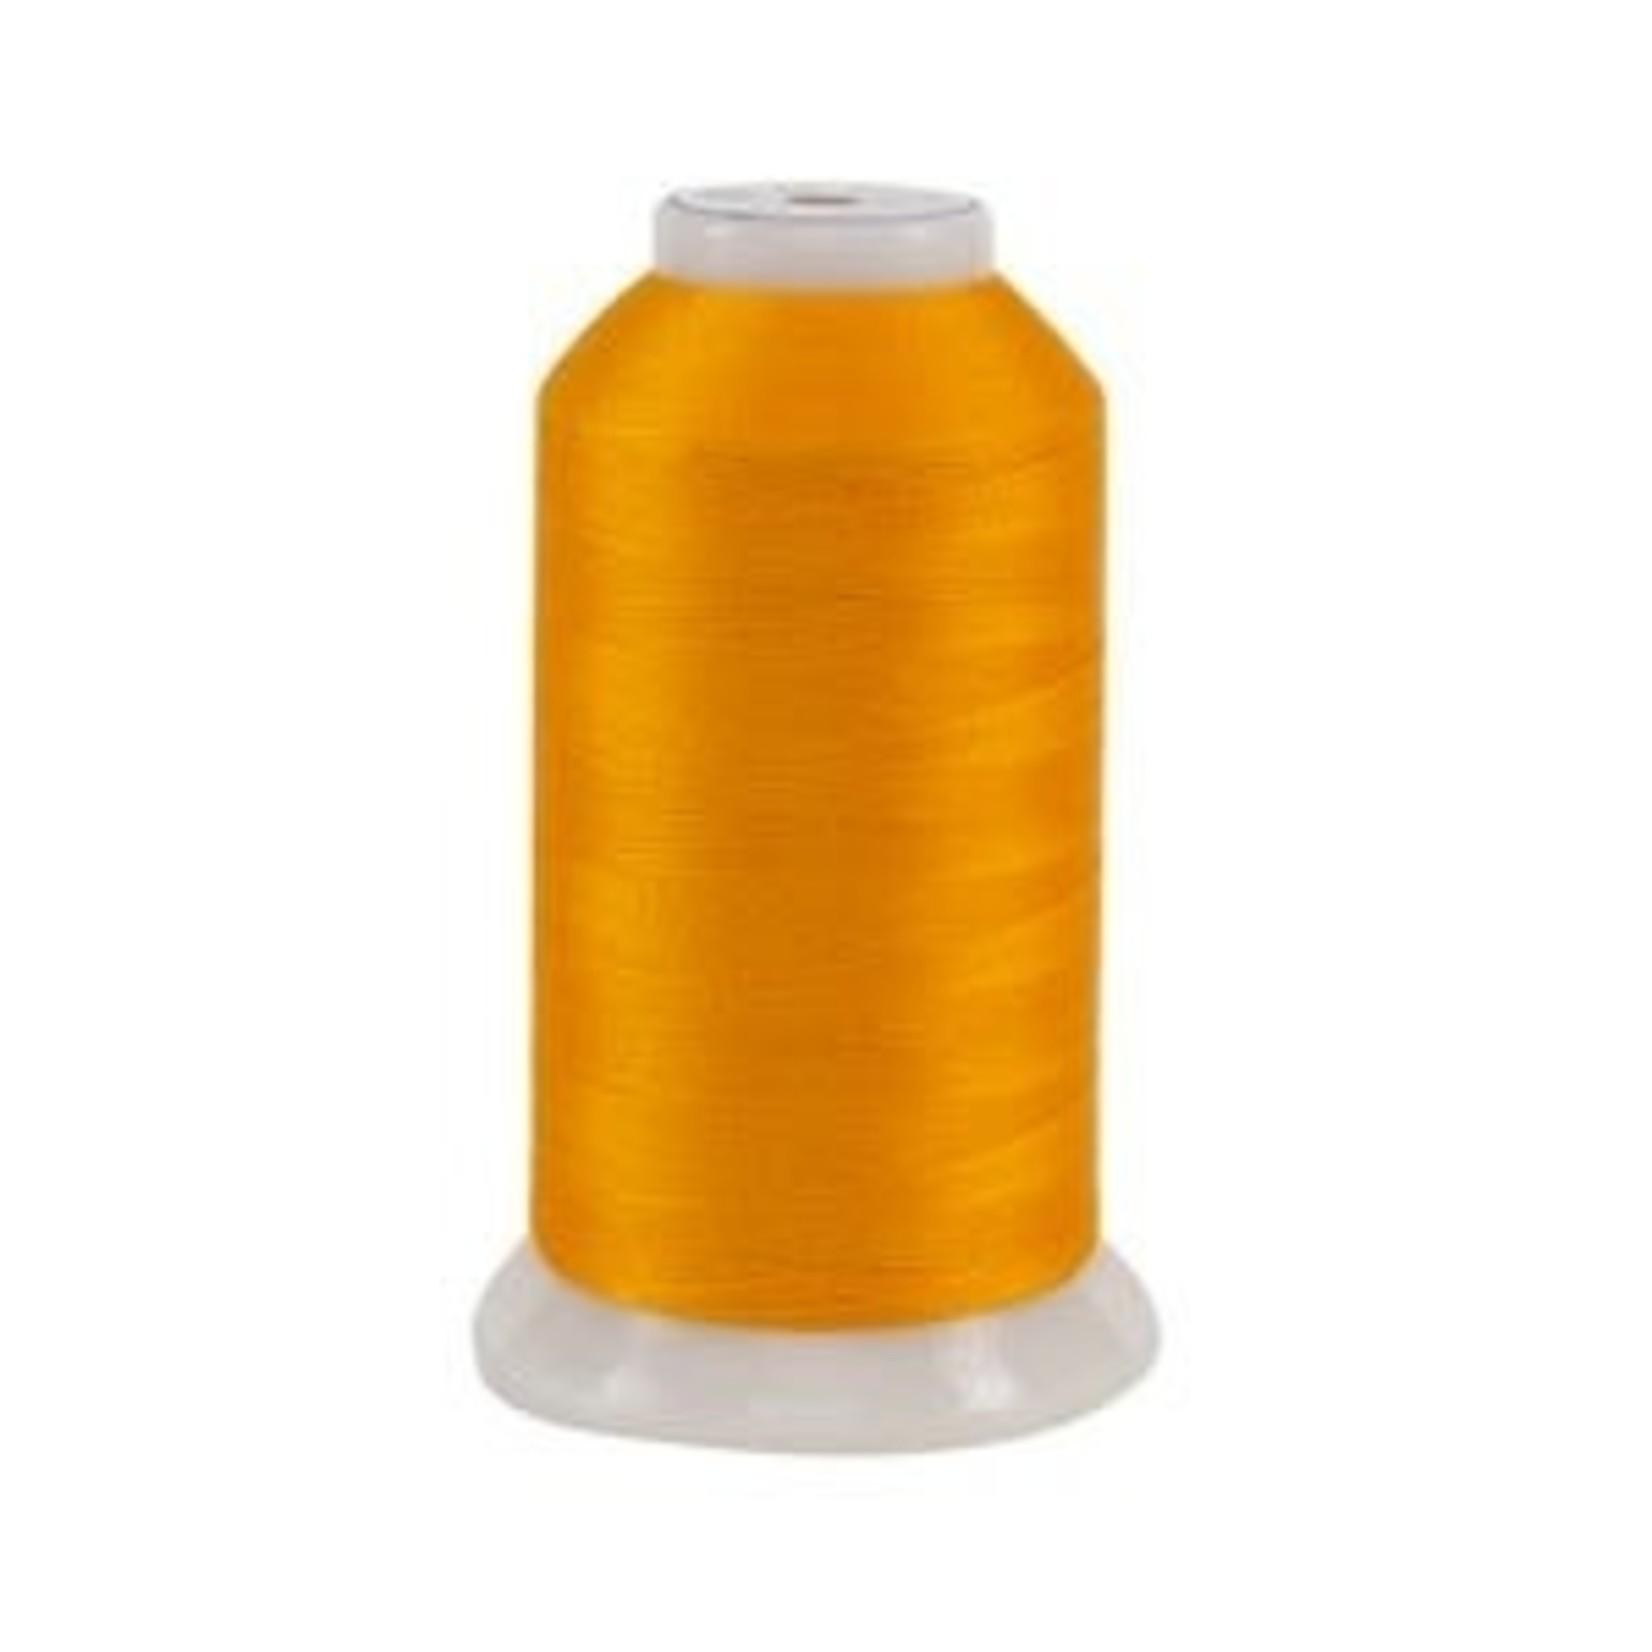 Superior Threads So Fine! 464 Butte-i-ful 3280